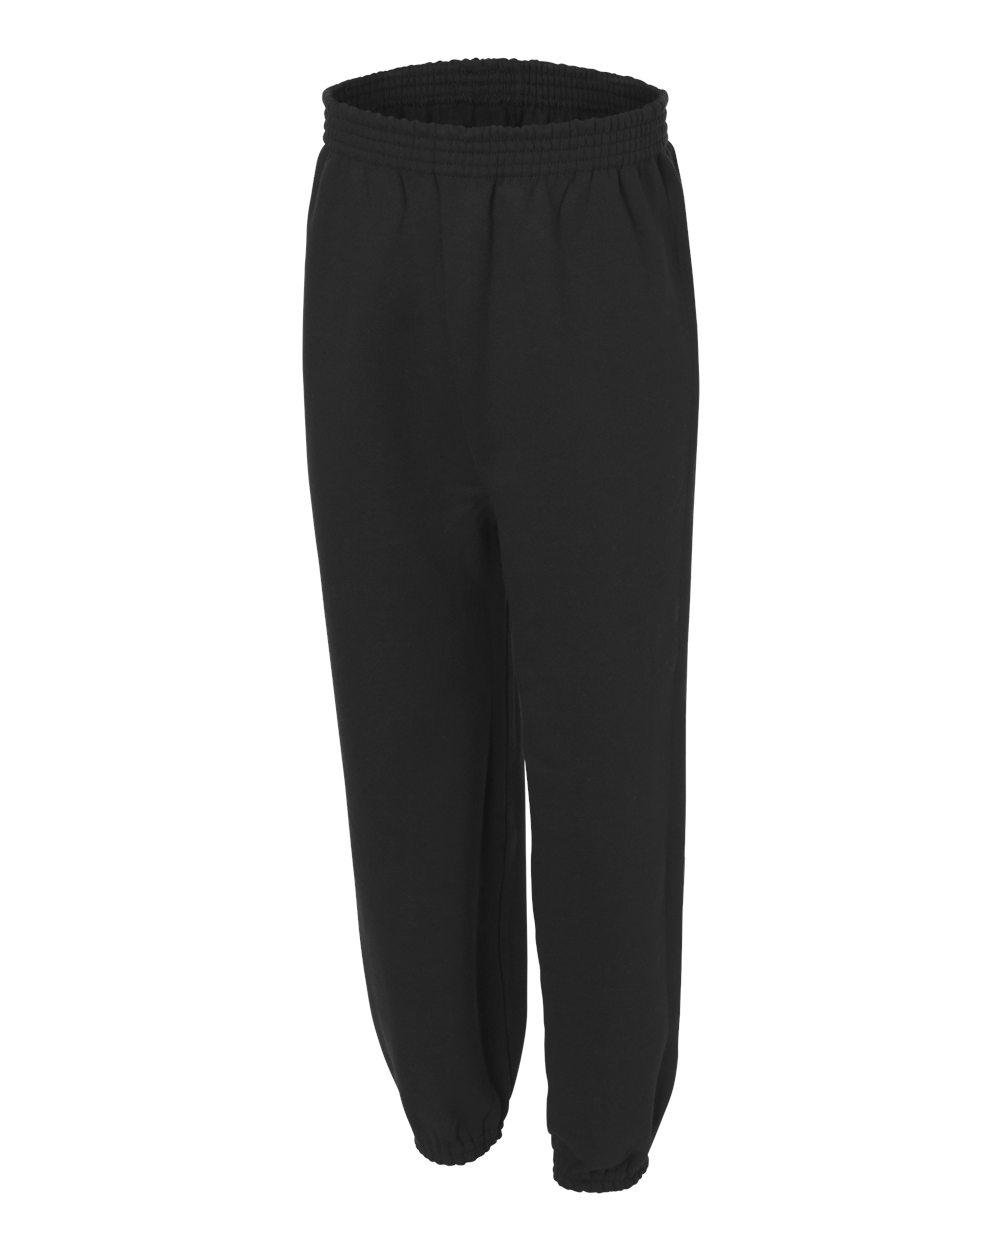 Hanes P450 - ComfortBlend EcoSmart Youth Sweatpants